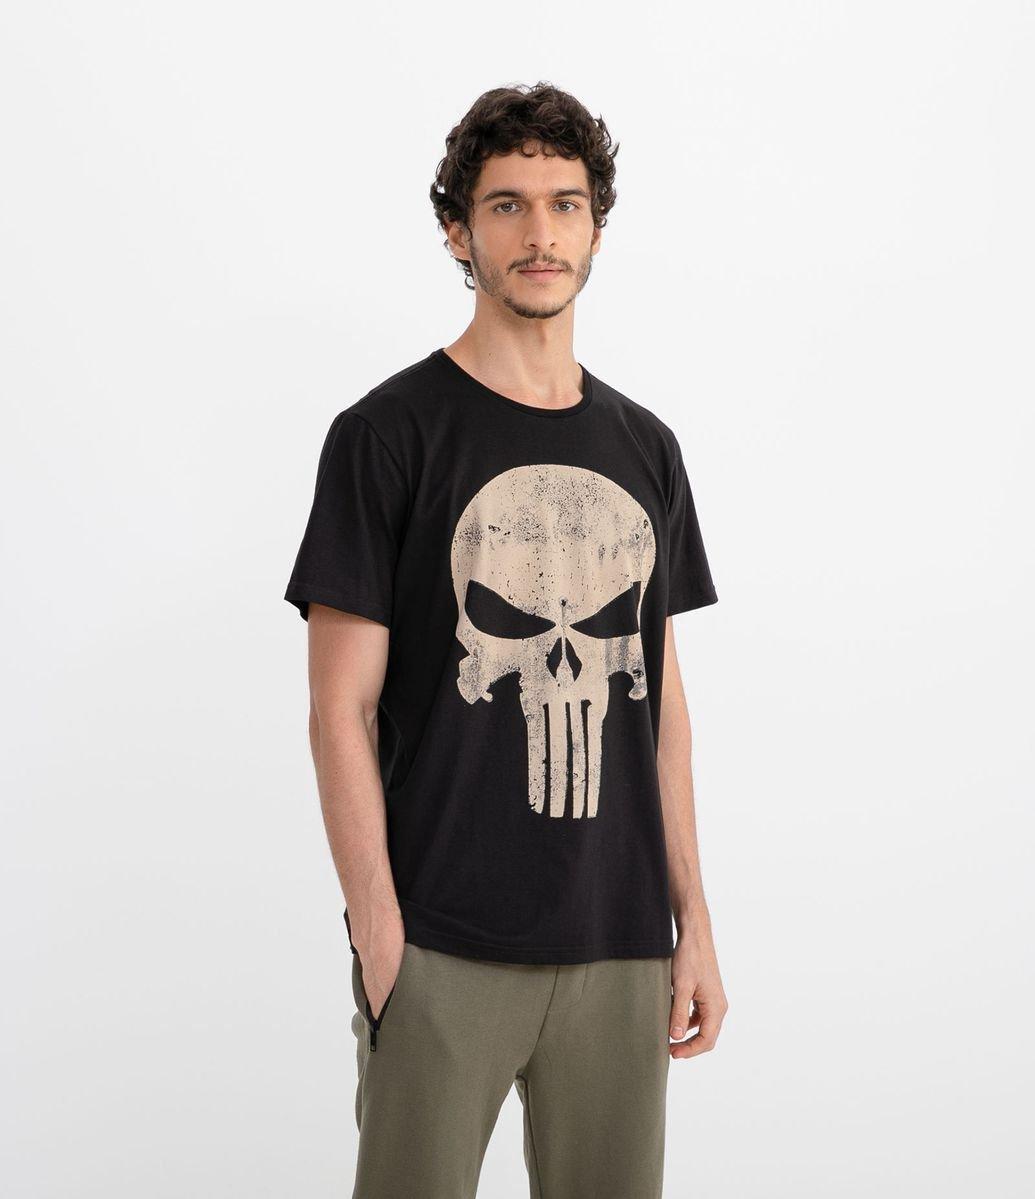 09ca9d938 Camiseta com Estampa Justiceiro - Renner